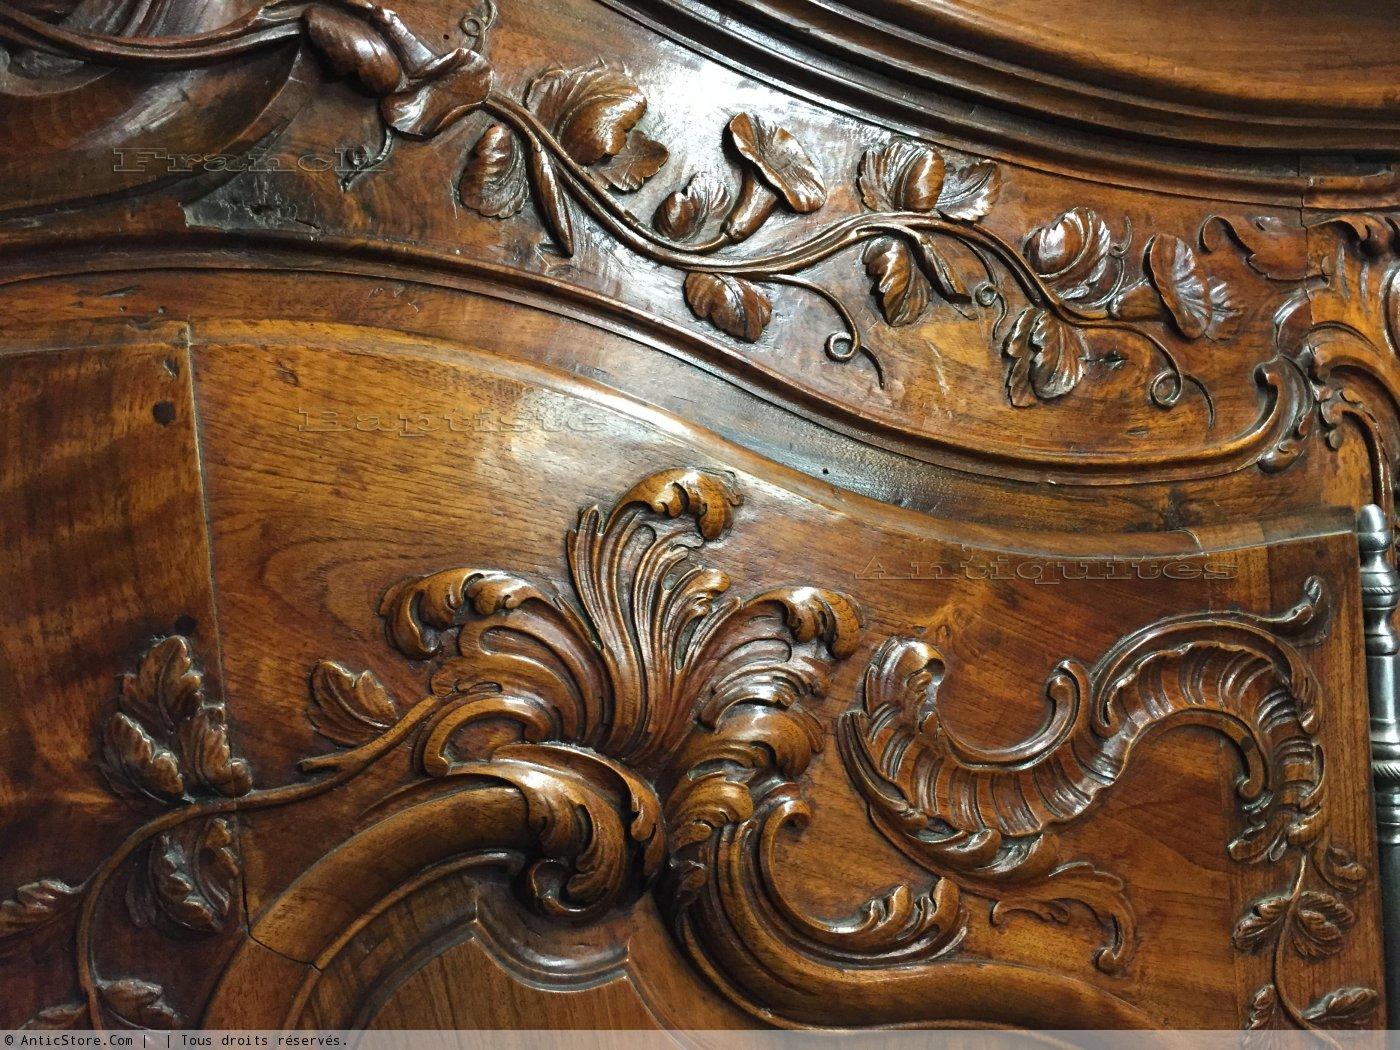 Armoire De Mariage Nmes Poque Louis XV XVIIIe Sicle